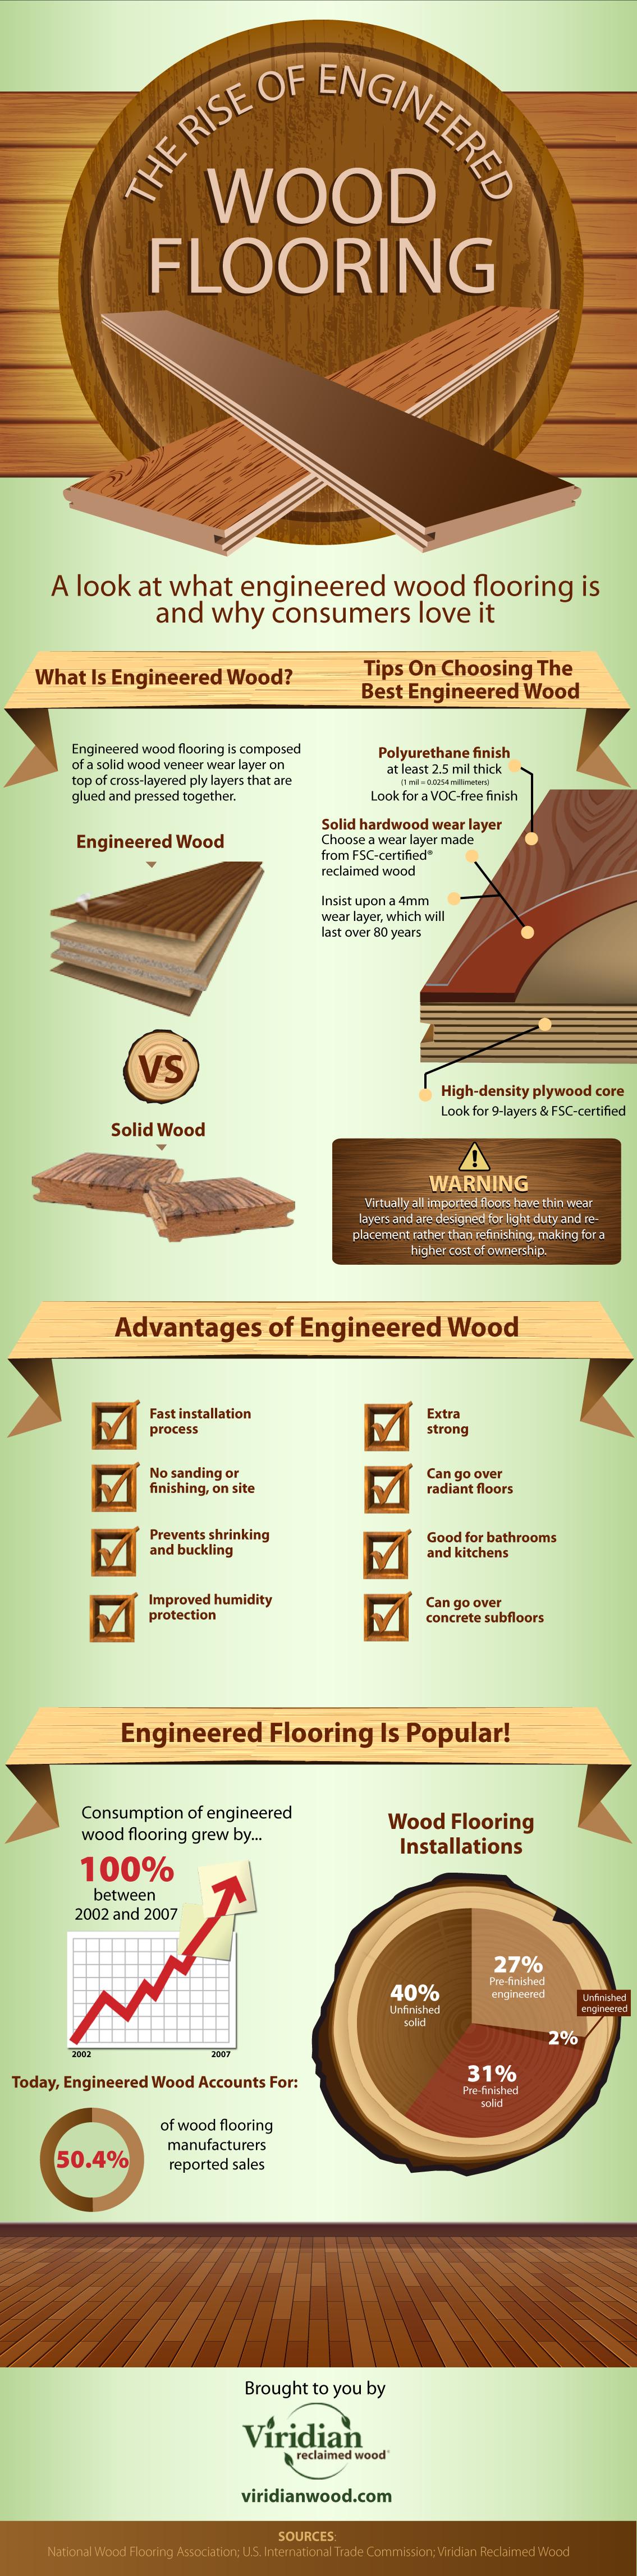 The Rise of Engineered Wood Flooring